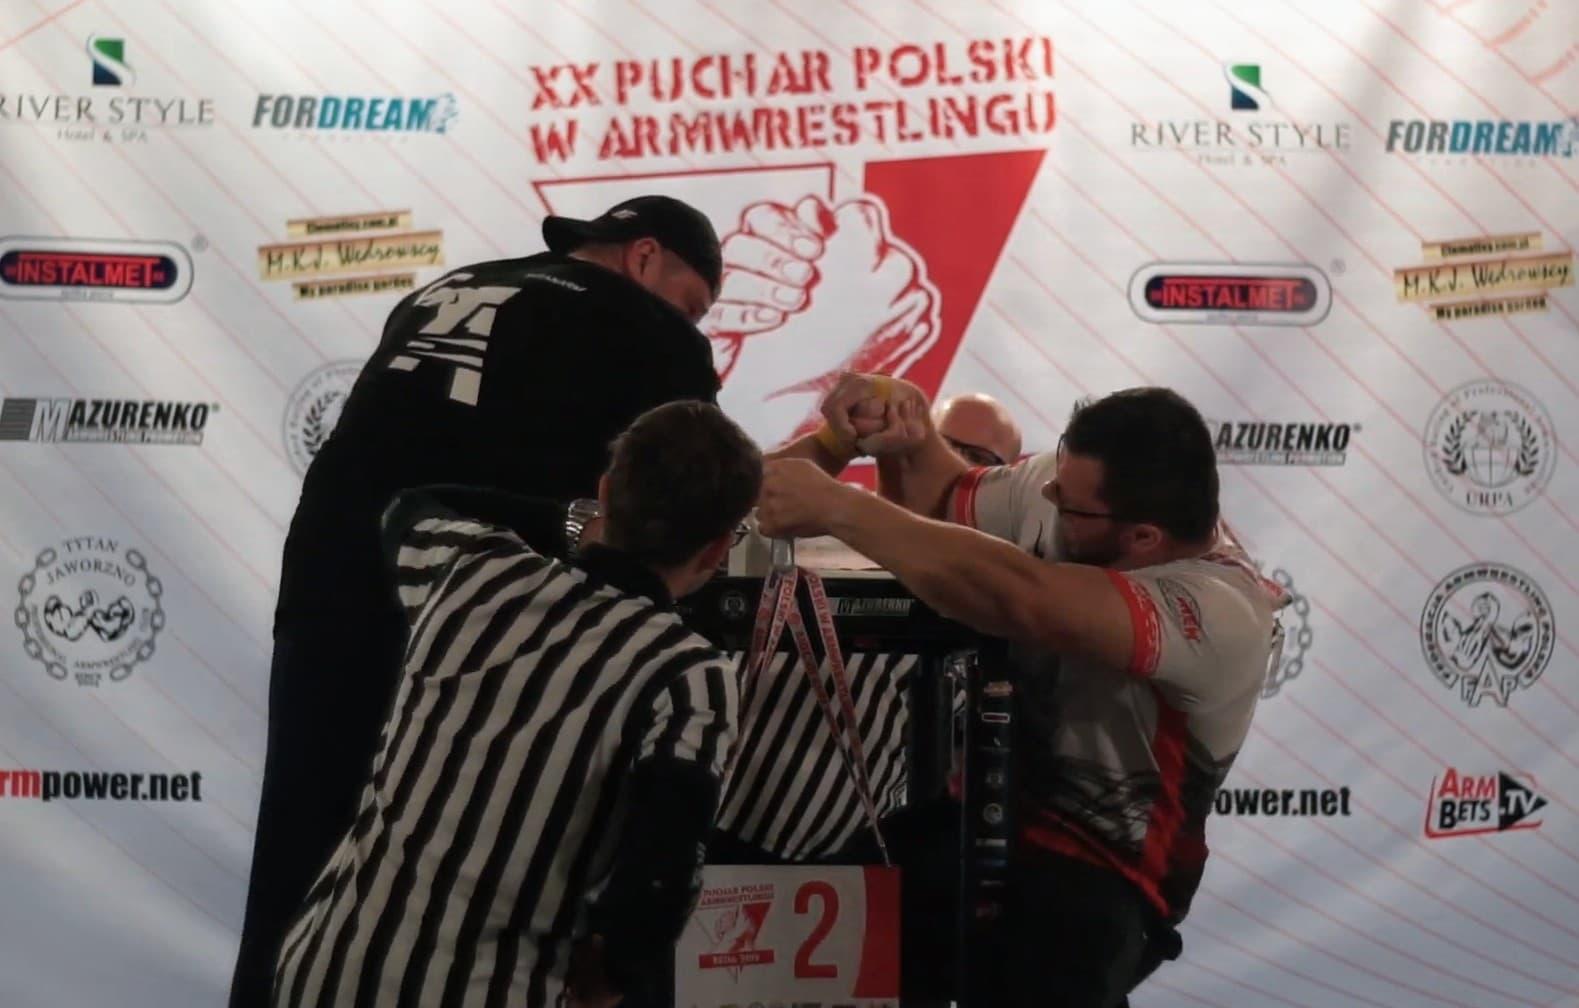 Puchar Polski w Armwrestlingu 2019